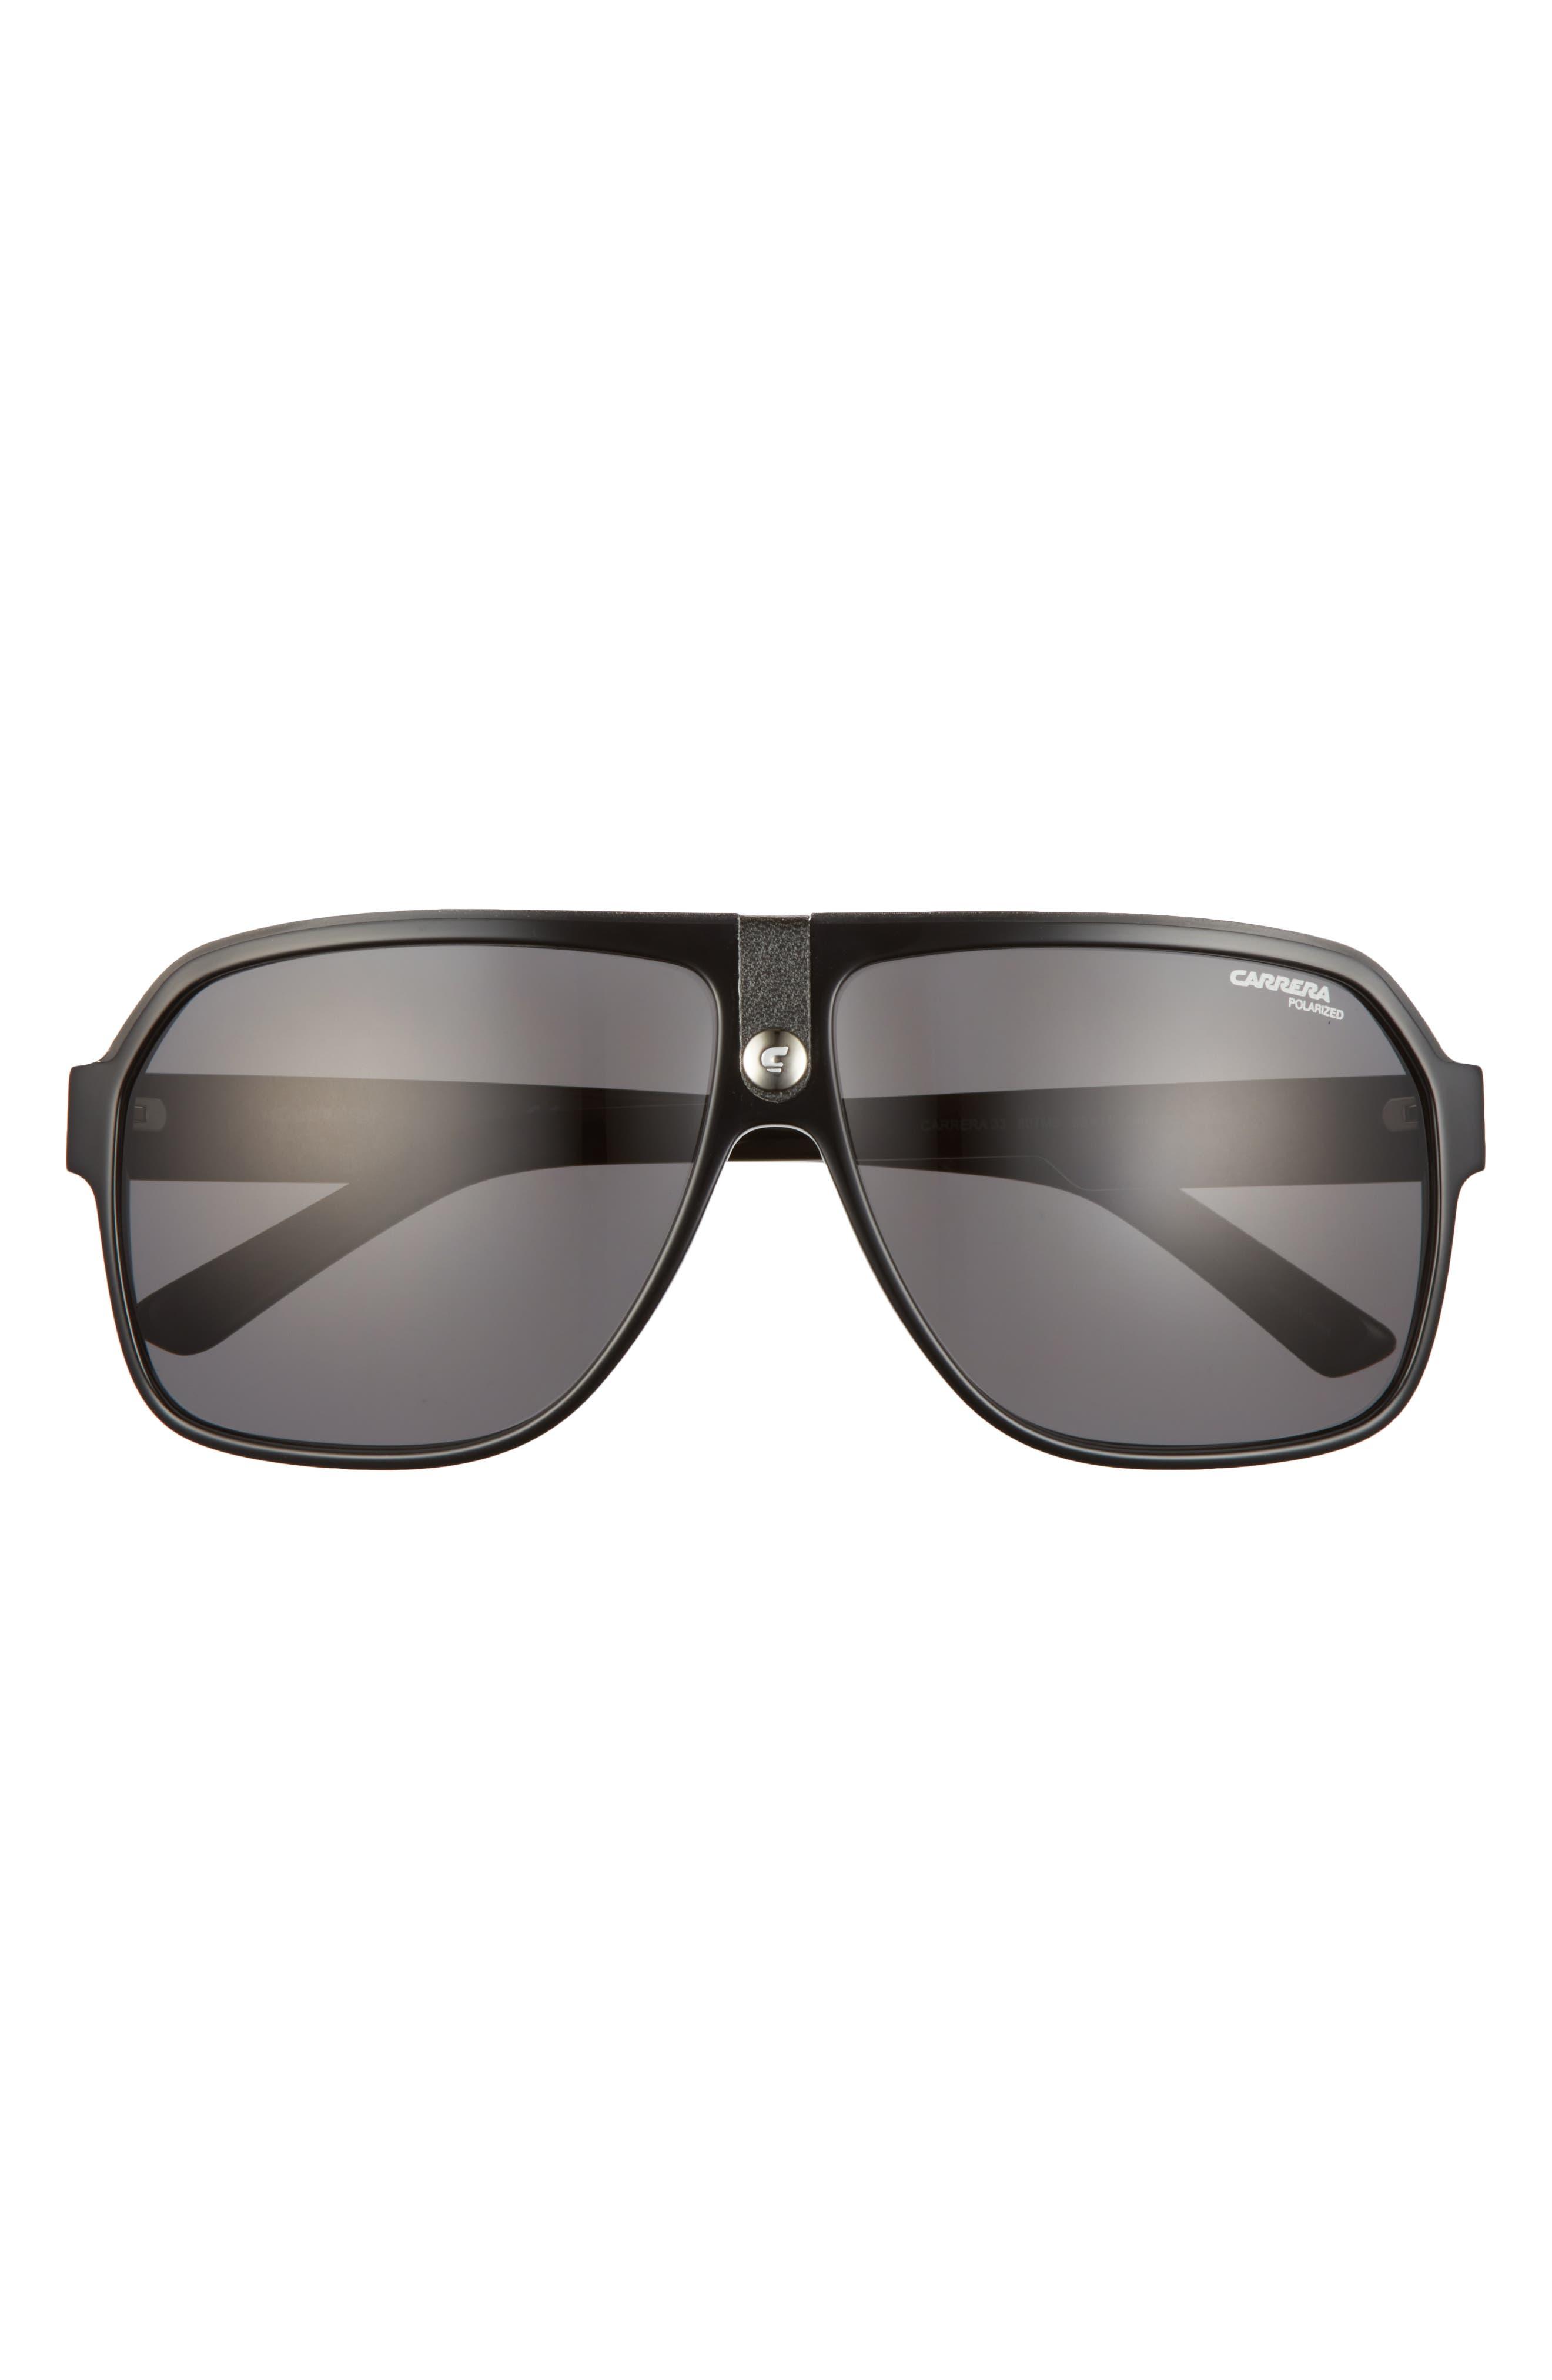 Men's Carrera 62mm Gradient Aviator Sunglasses